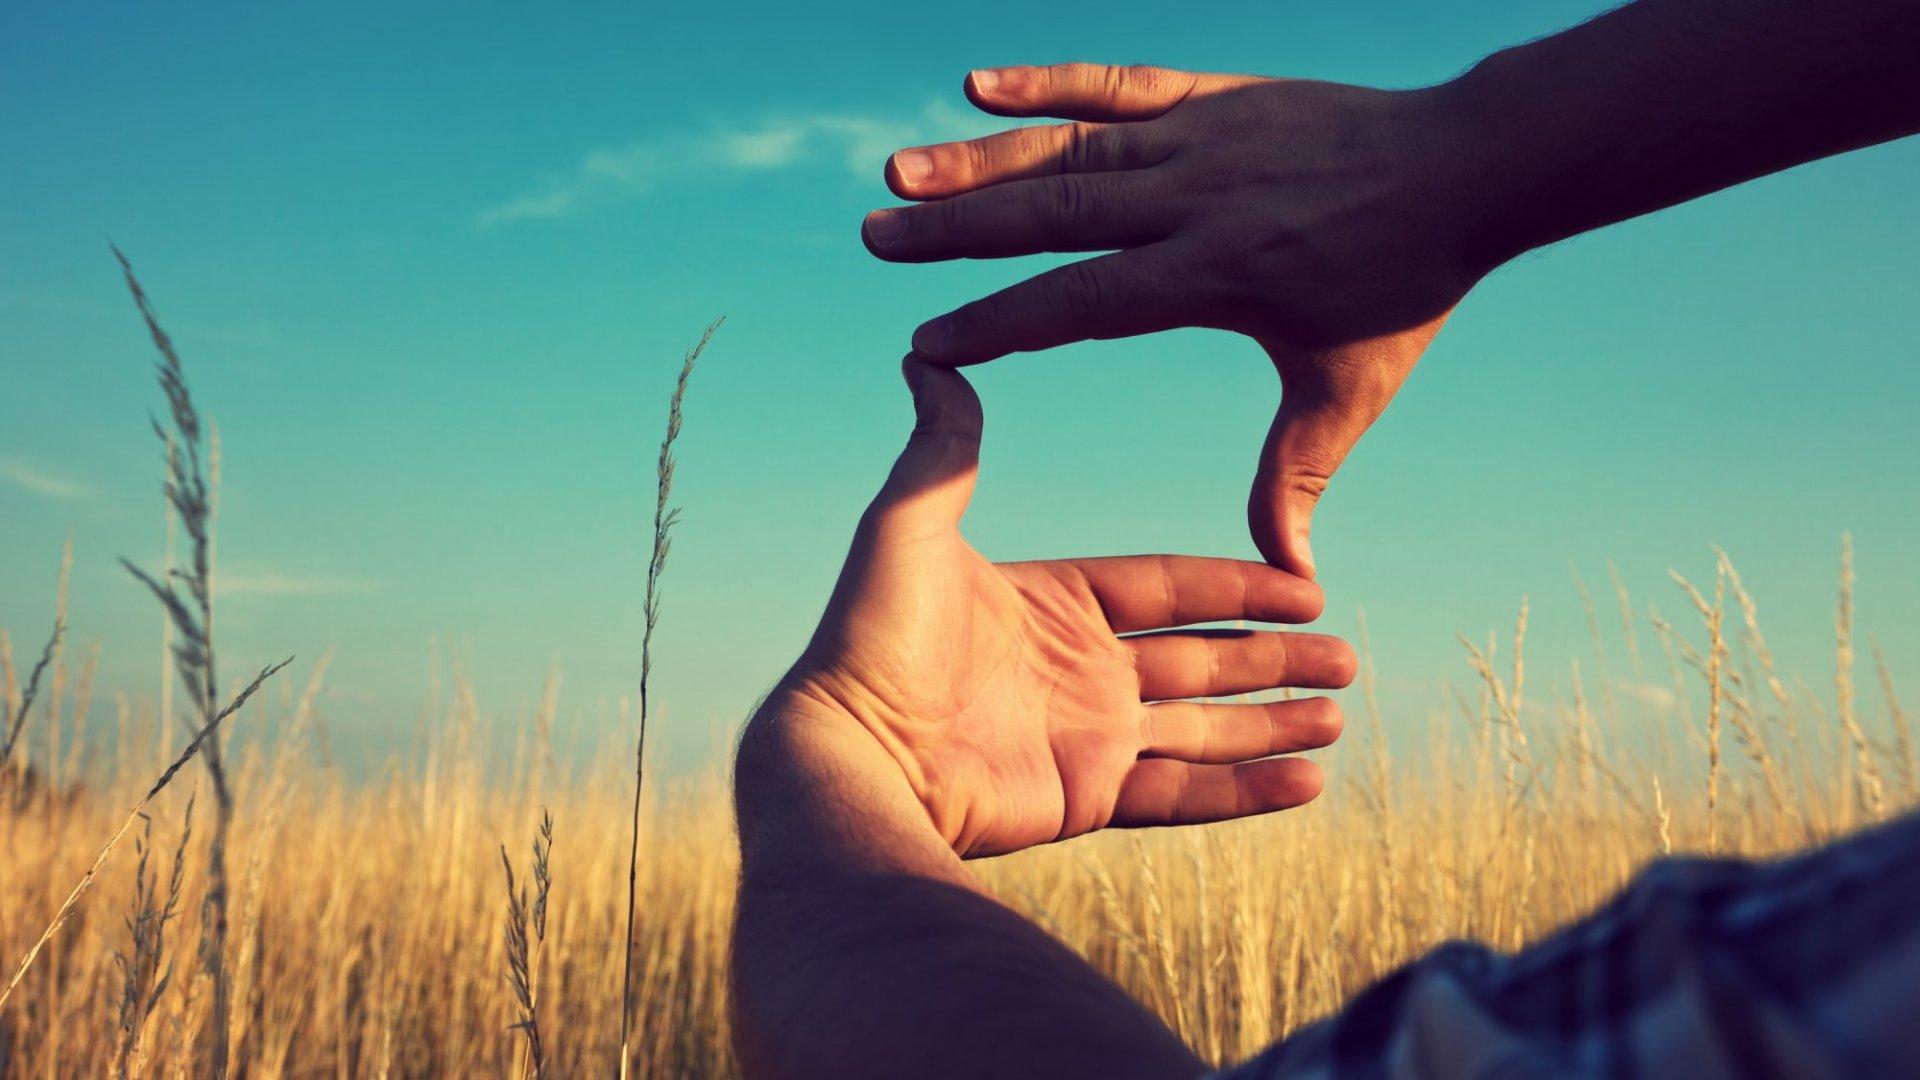 To Transform Your Life, Set (Realistic) Goals